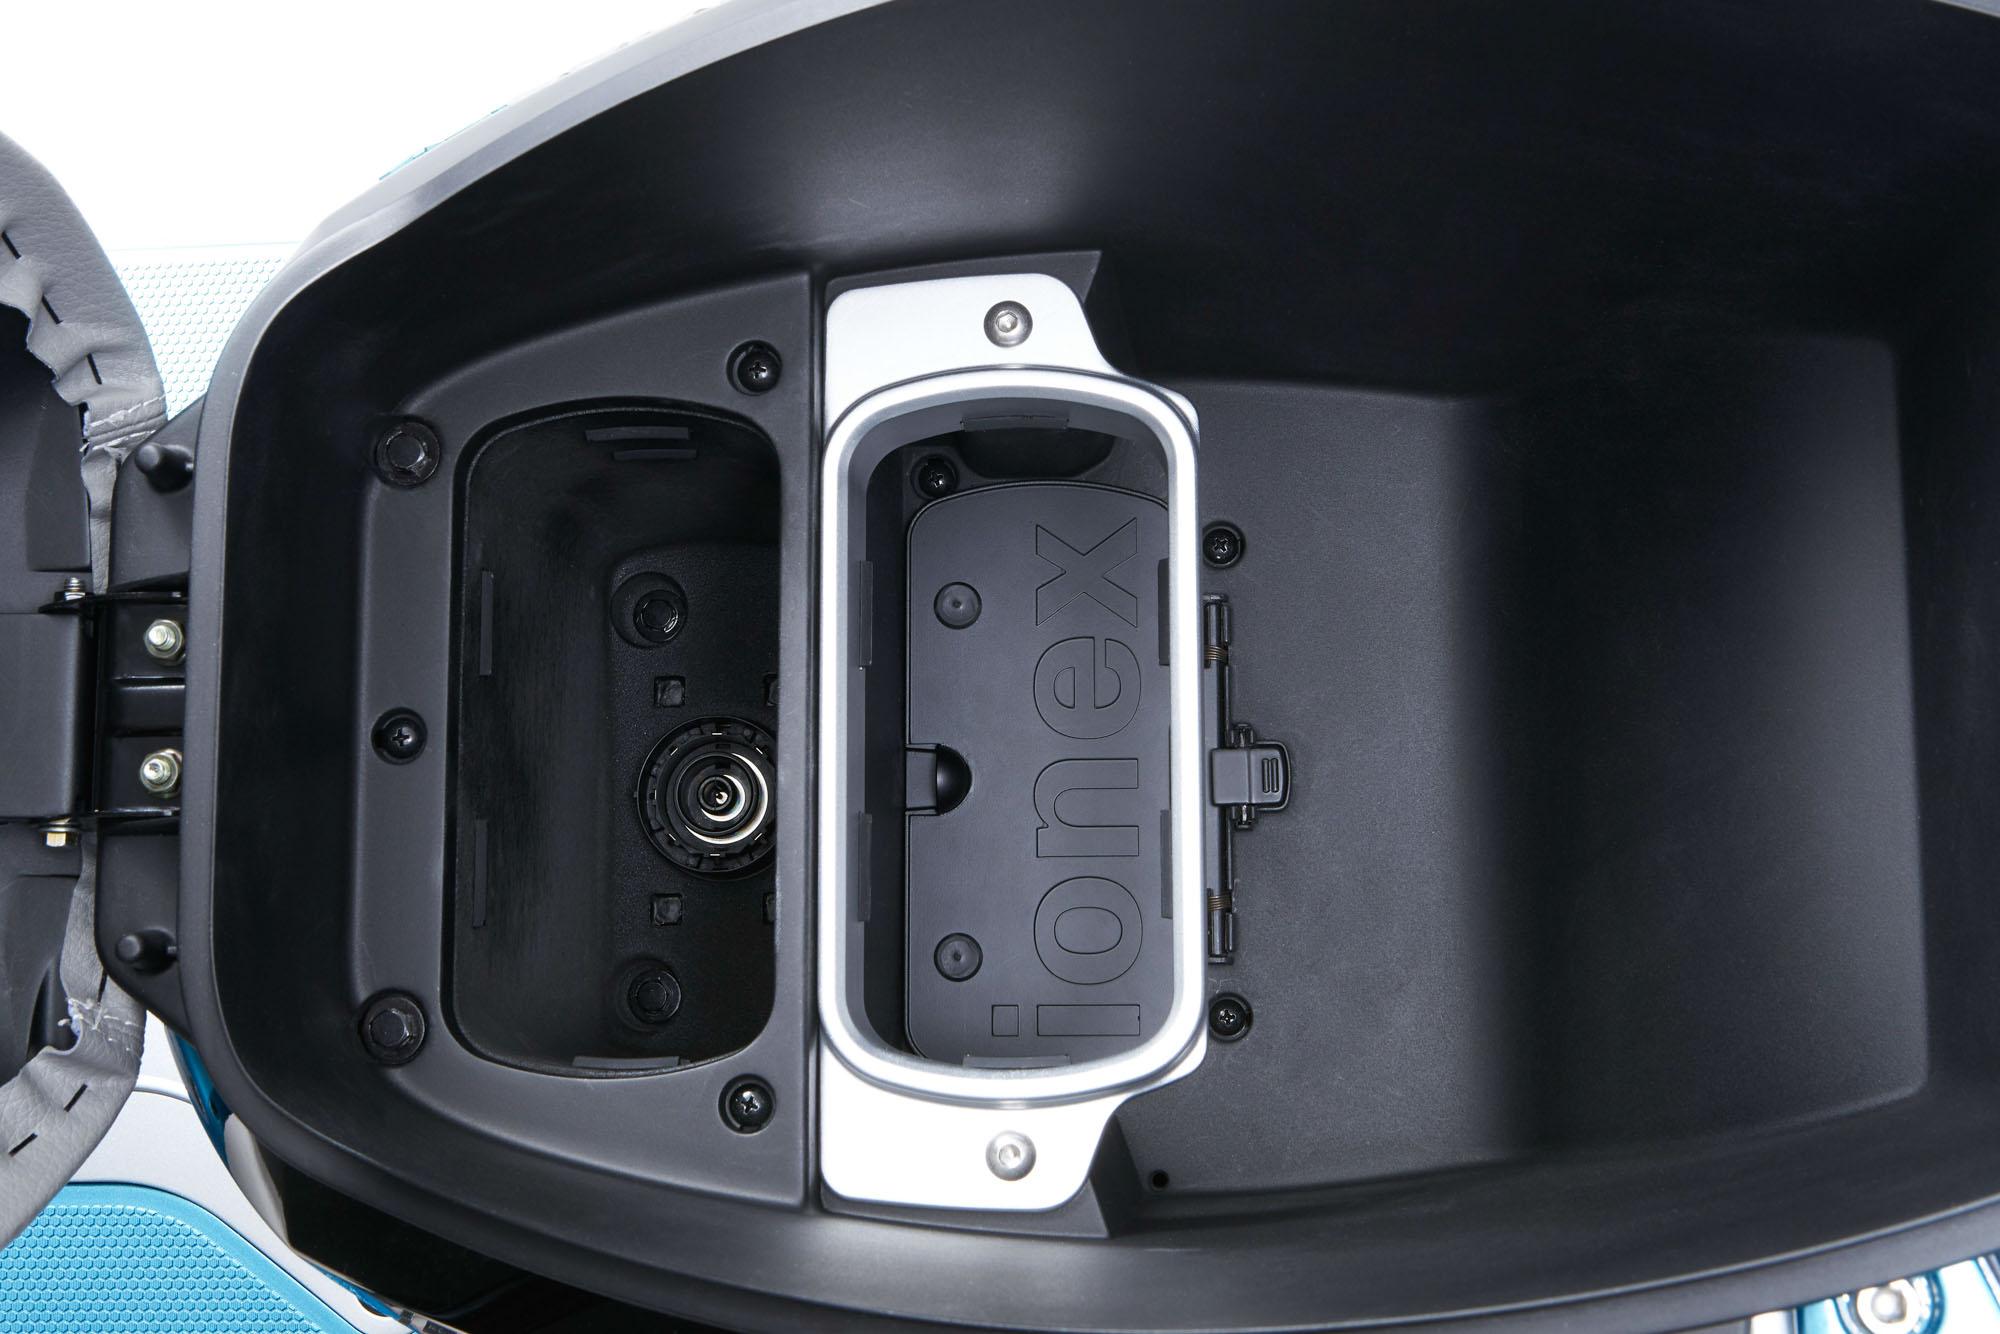 i-One DX 極速方面也從原本的 61km/h 提升至 74km/h,增加了 20%。